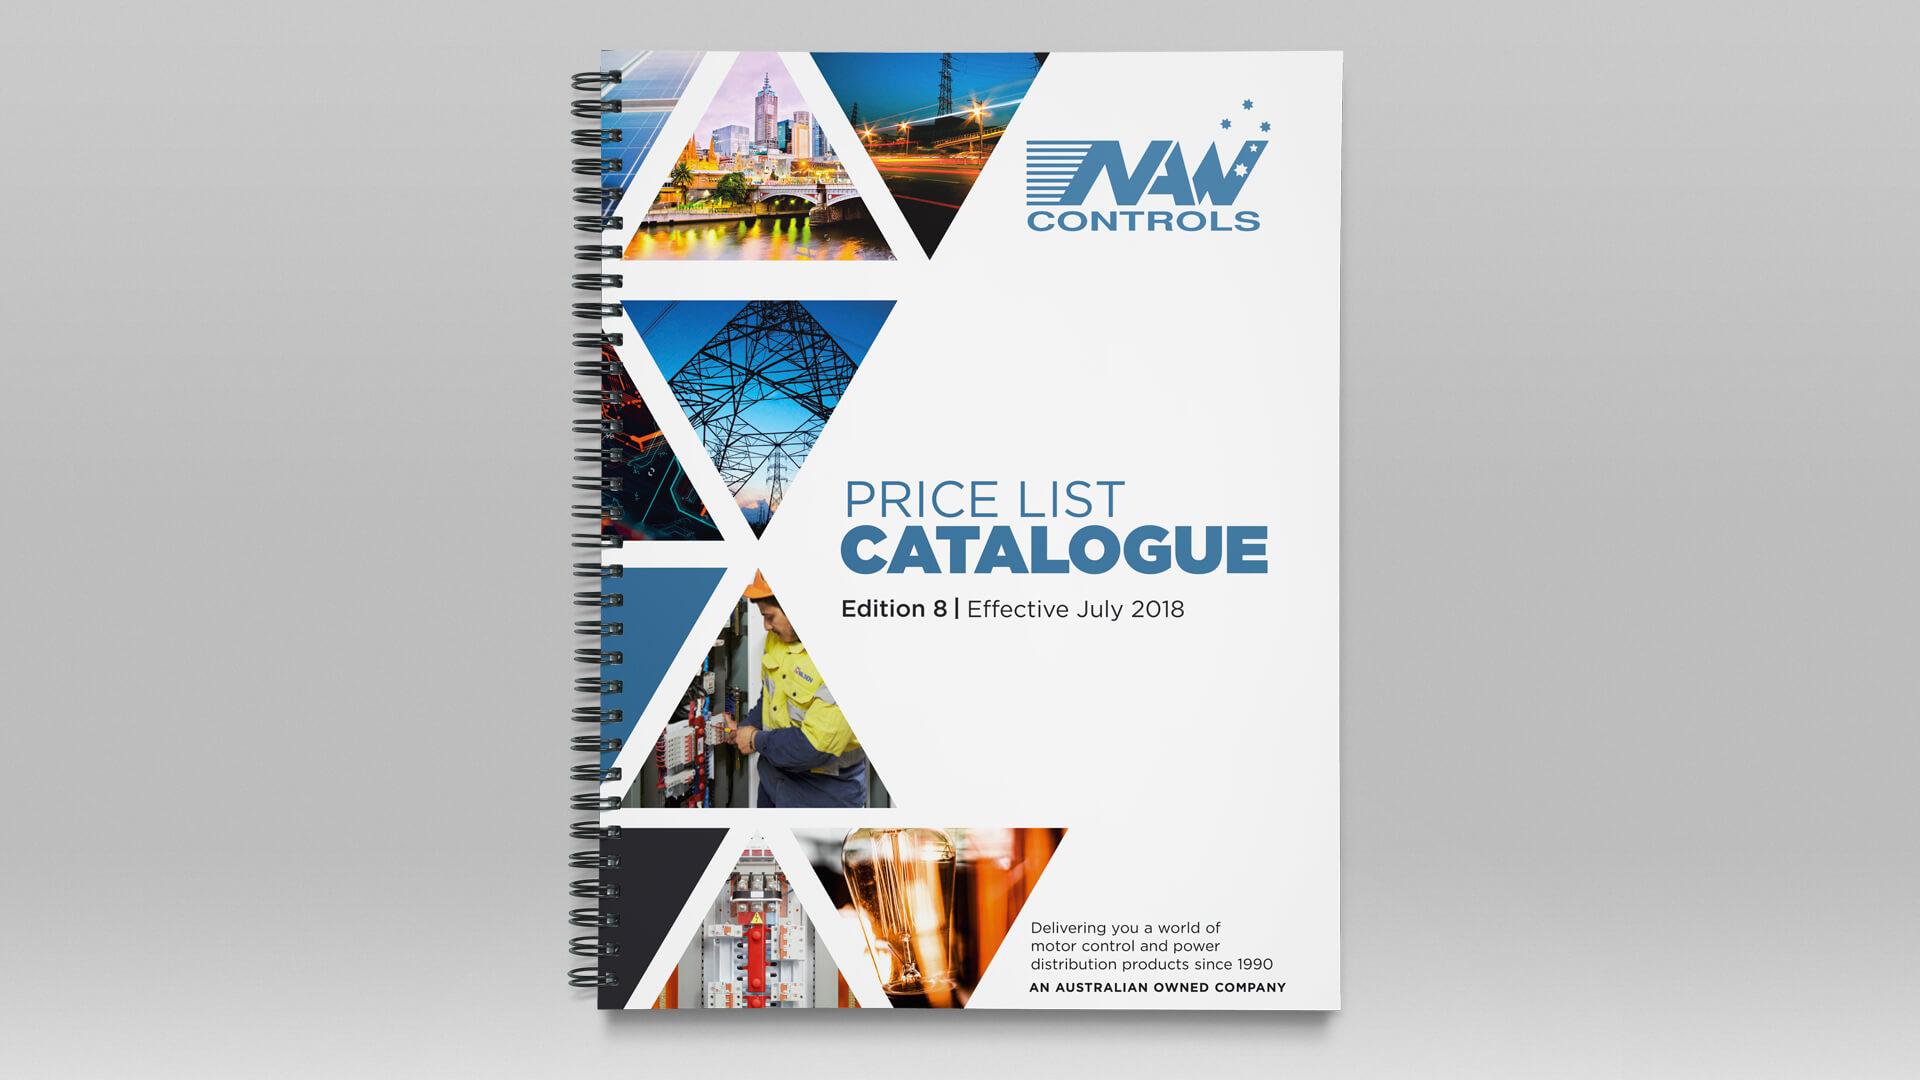 Pricelist Catalogue